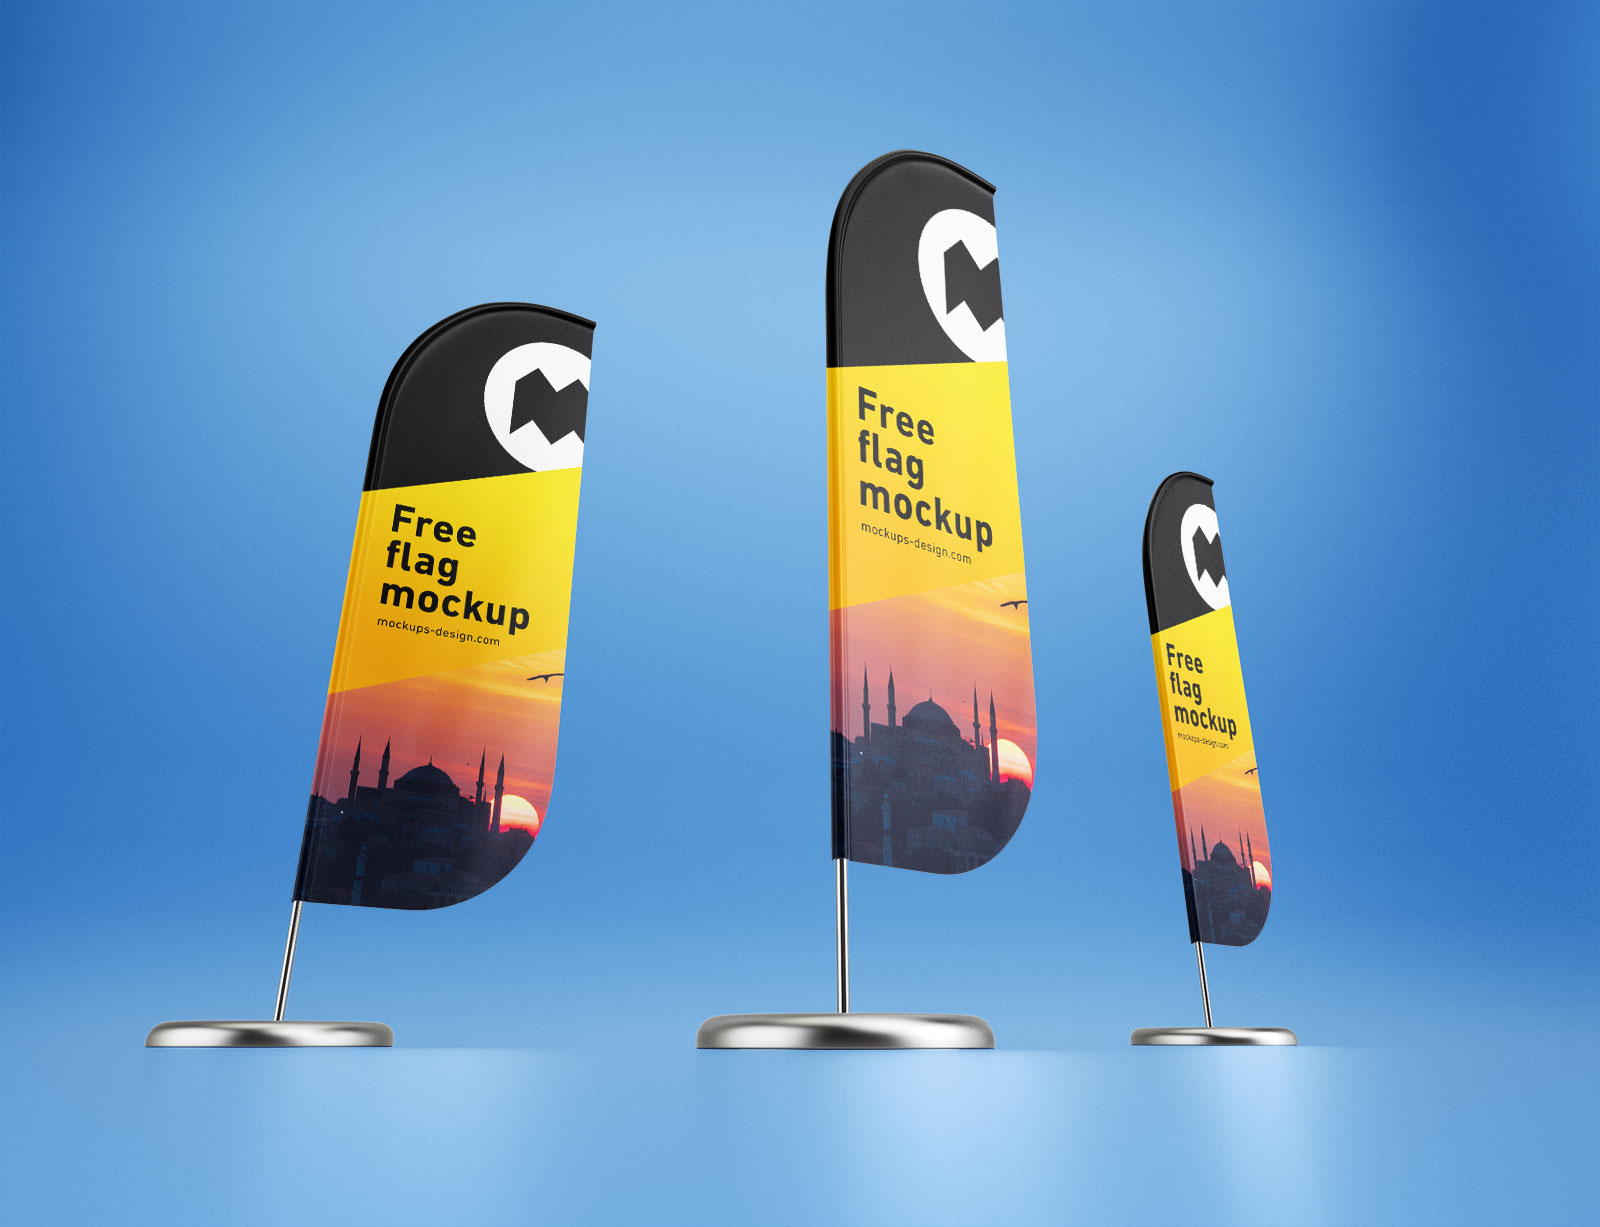 Free-Promotional-Winder-Feather-Flag-Mockup-PSD-Set-2